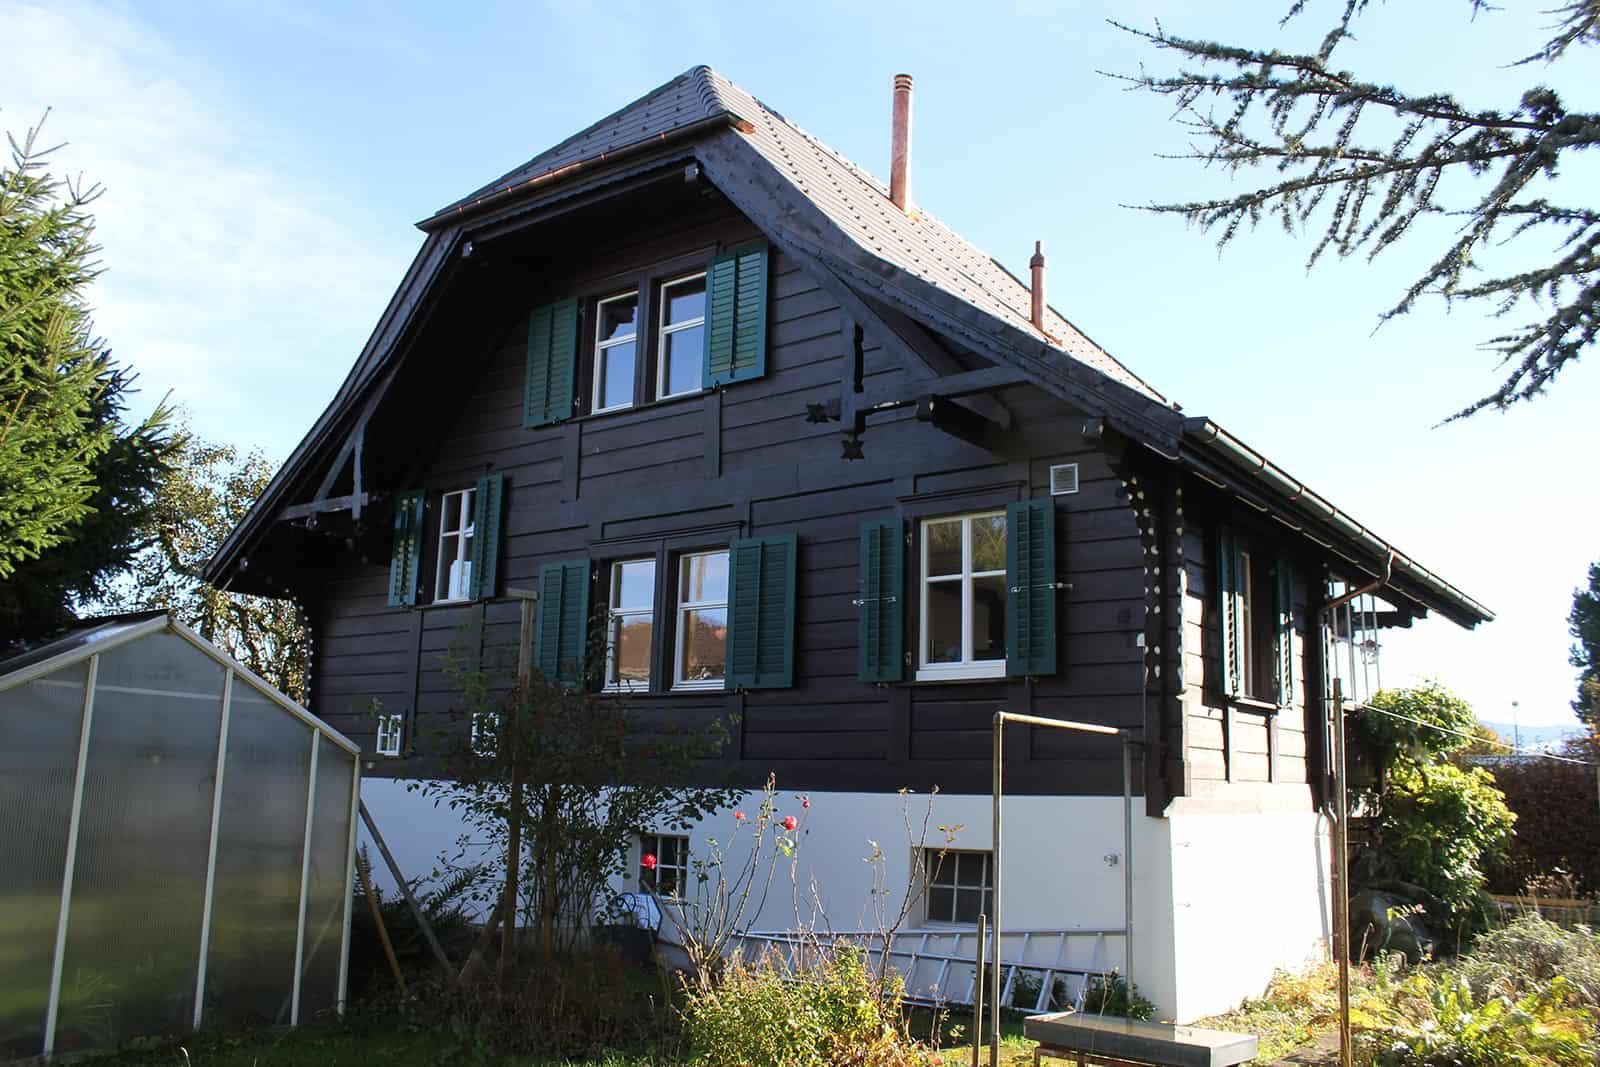 seeriestrasse 4 arbon historfen historische fenster renovieren. Black Bedroom Furniture Sets. Home Design Ideas